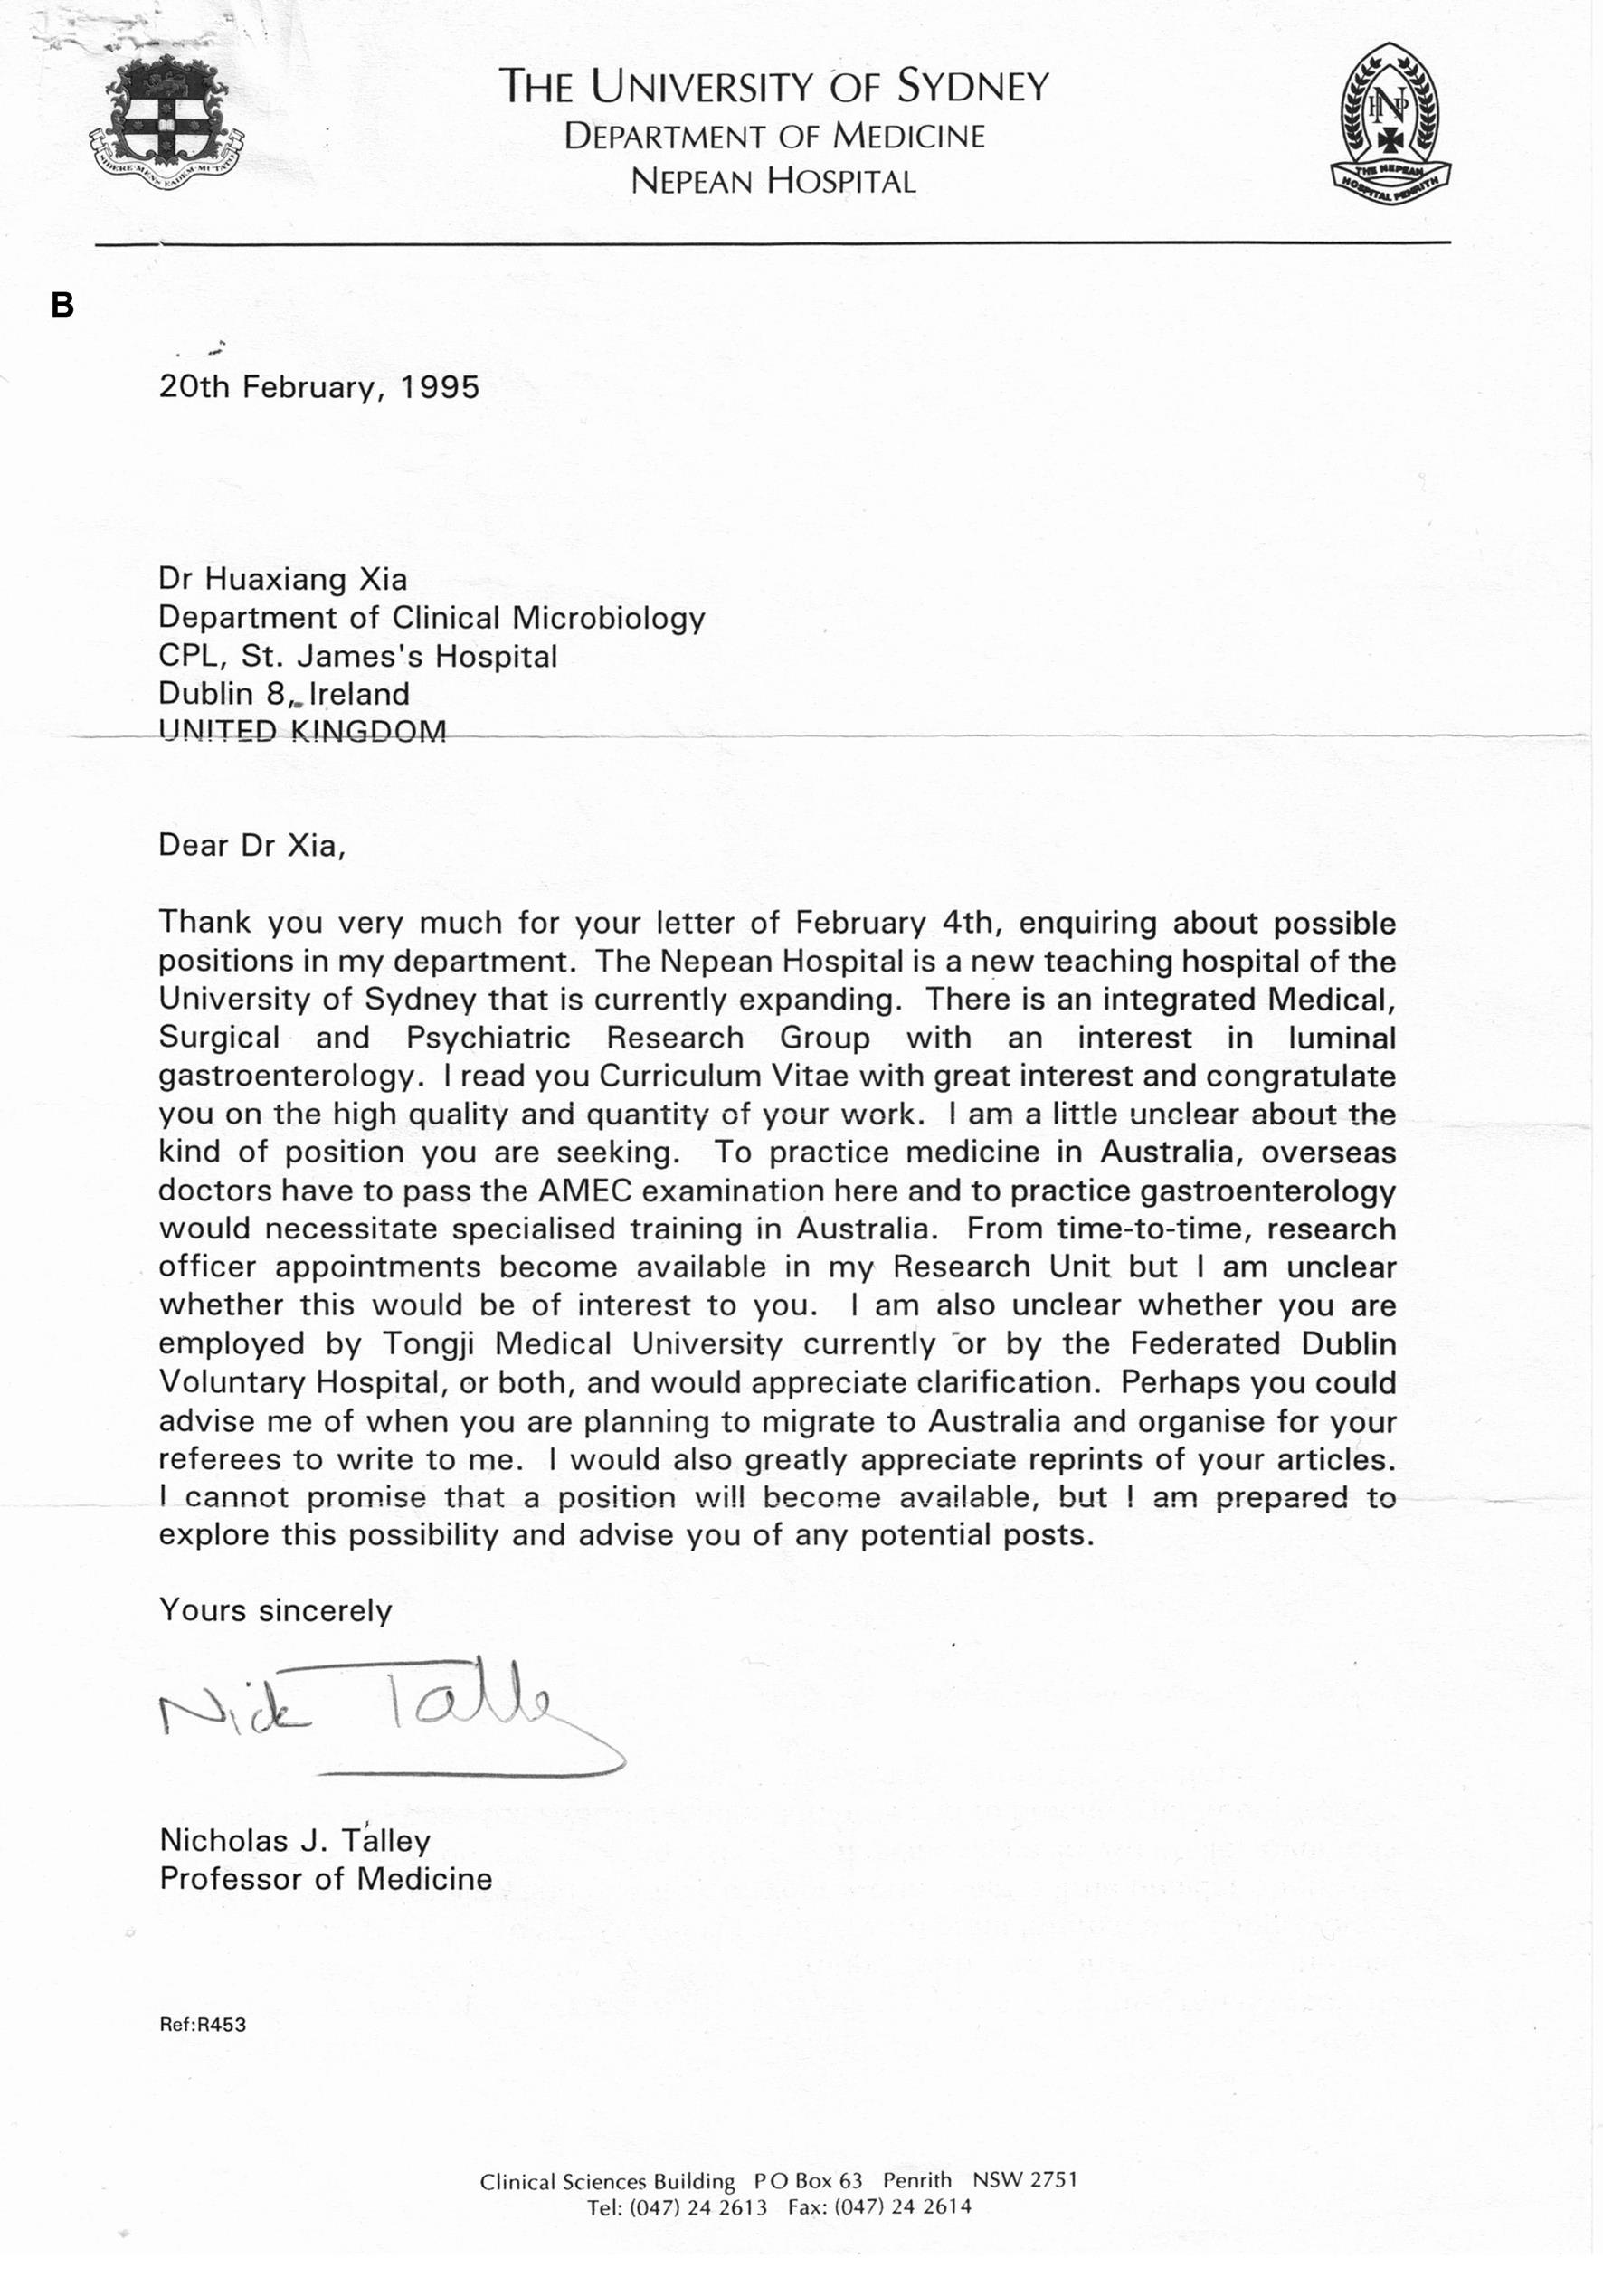 Talley教授1995年的回复信。